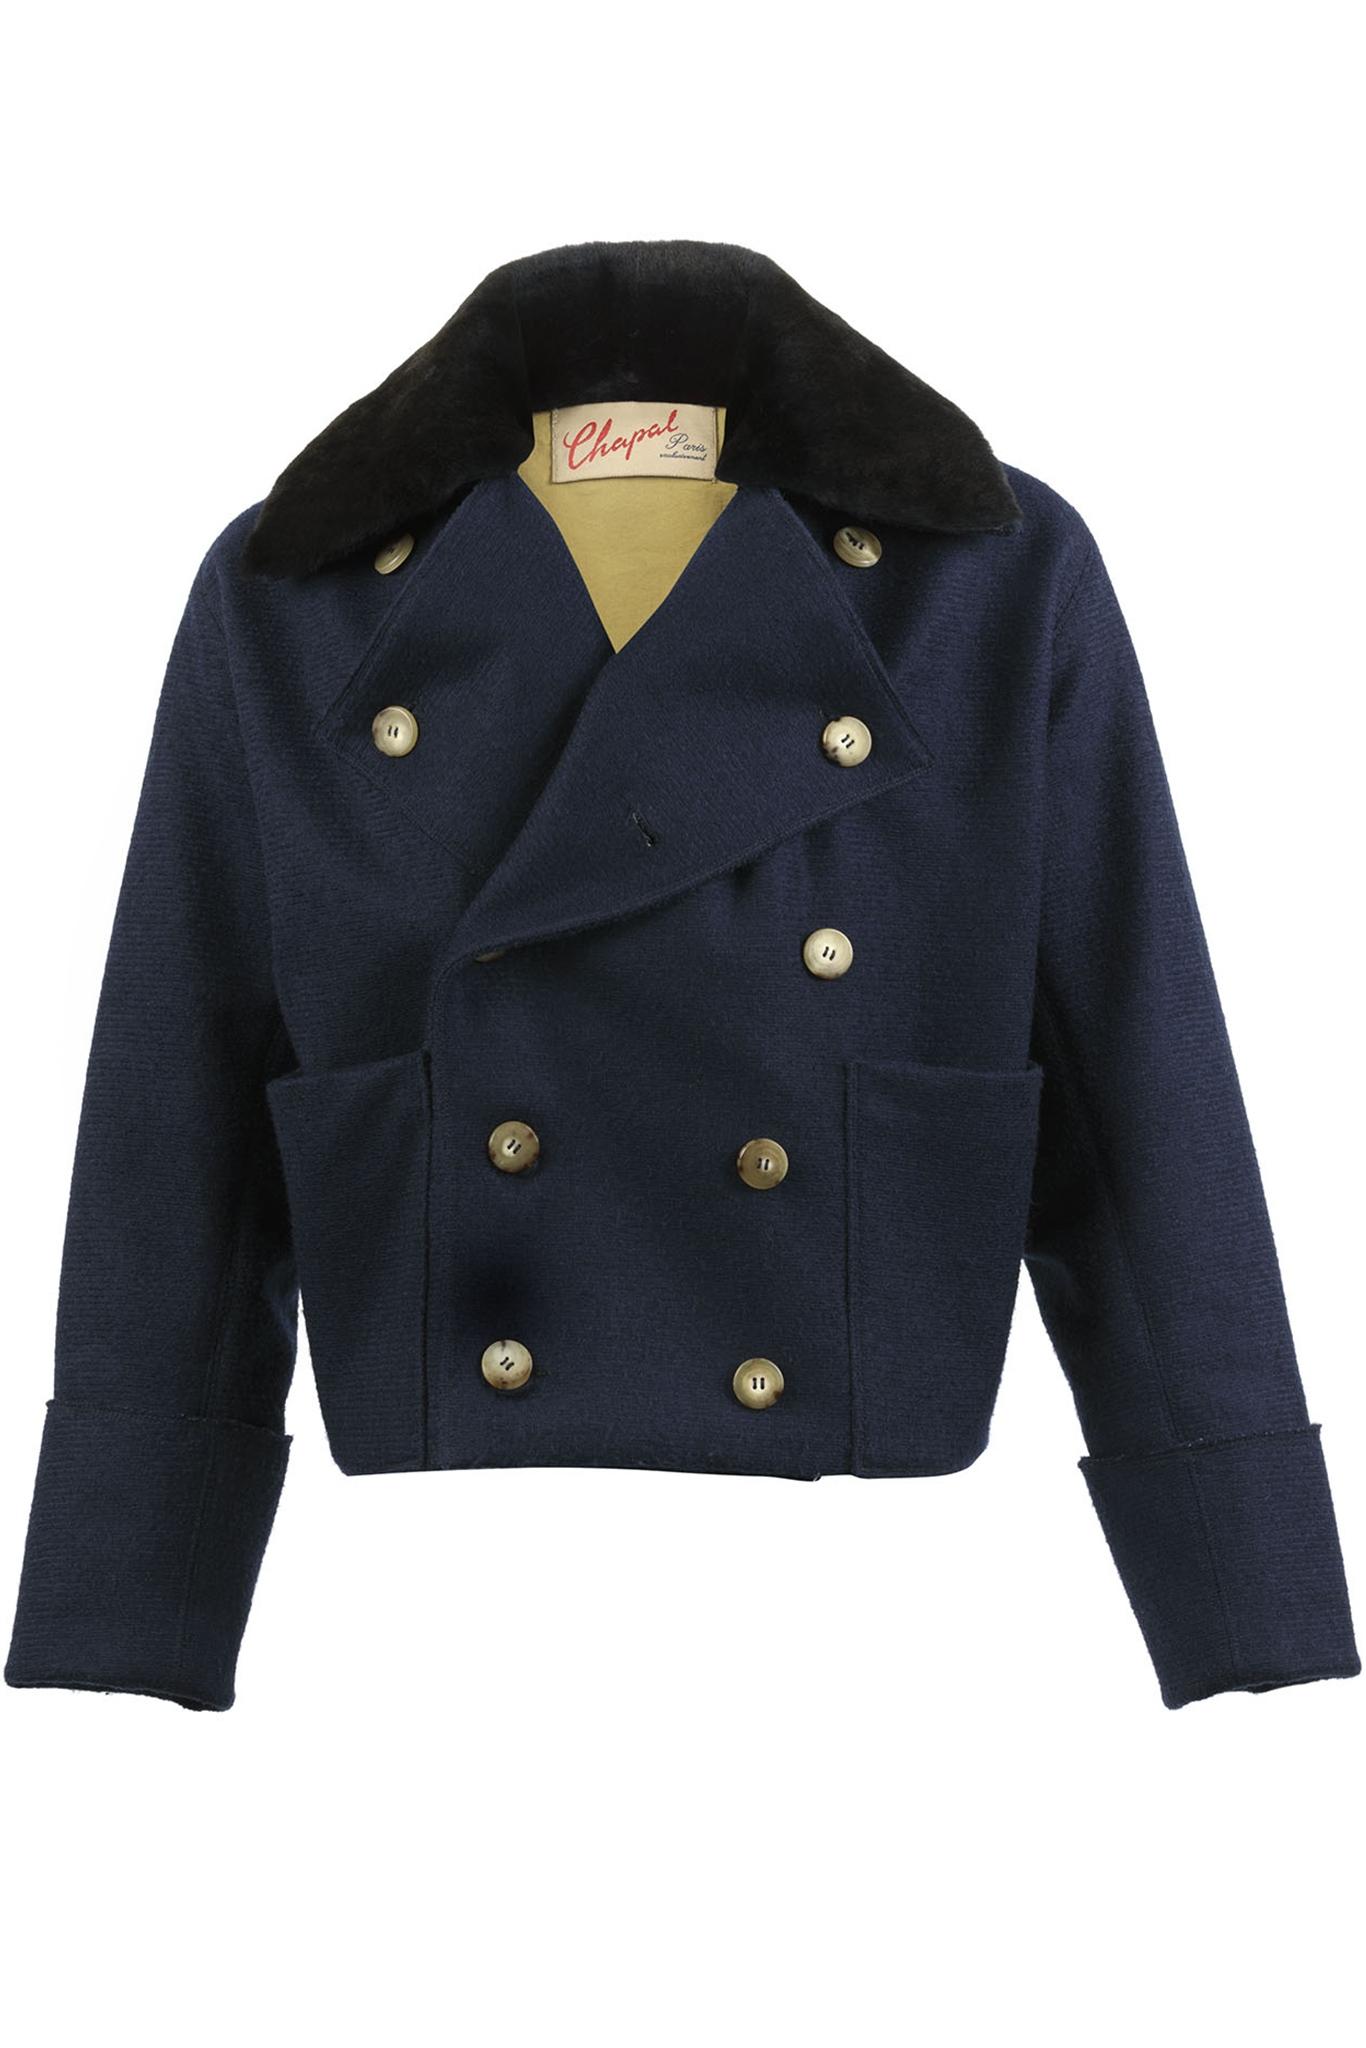 1814 Empire Vest - Merino wool - Blue color